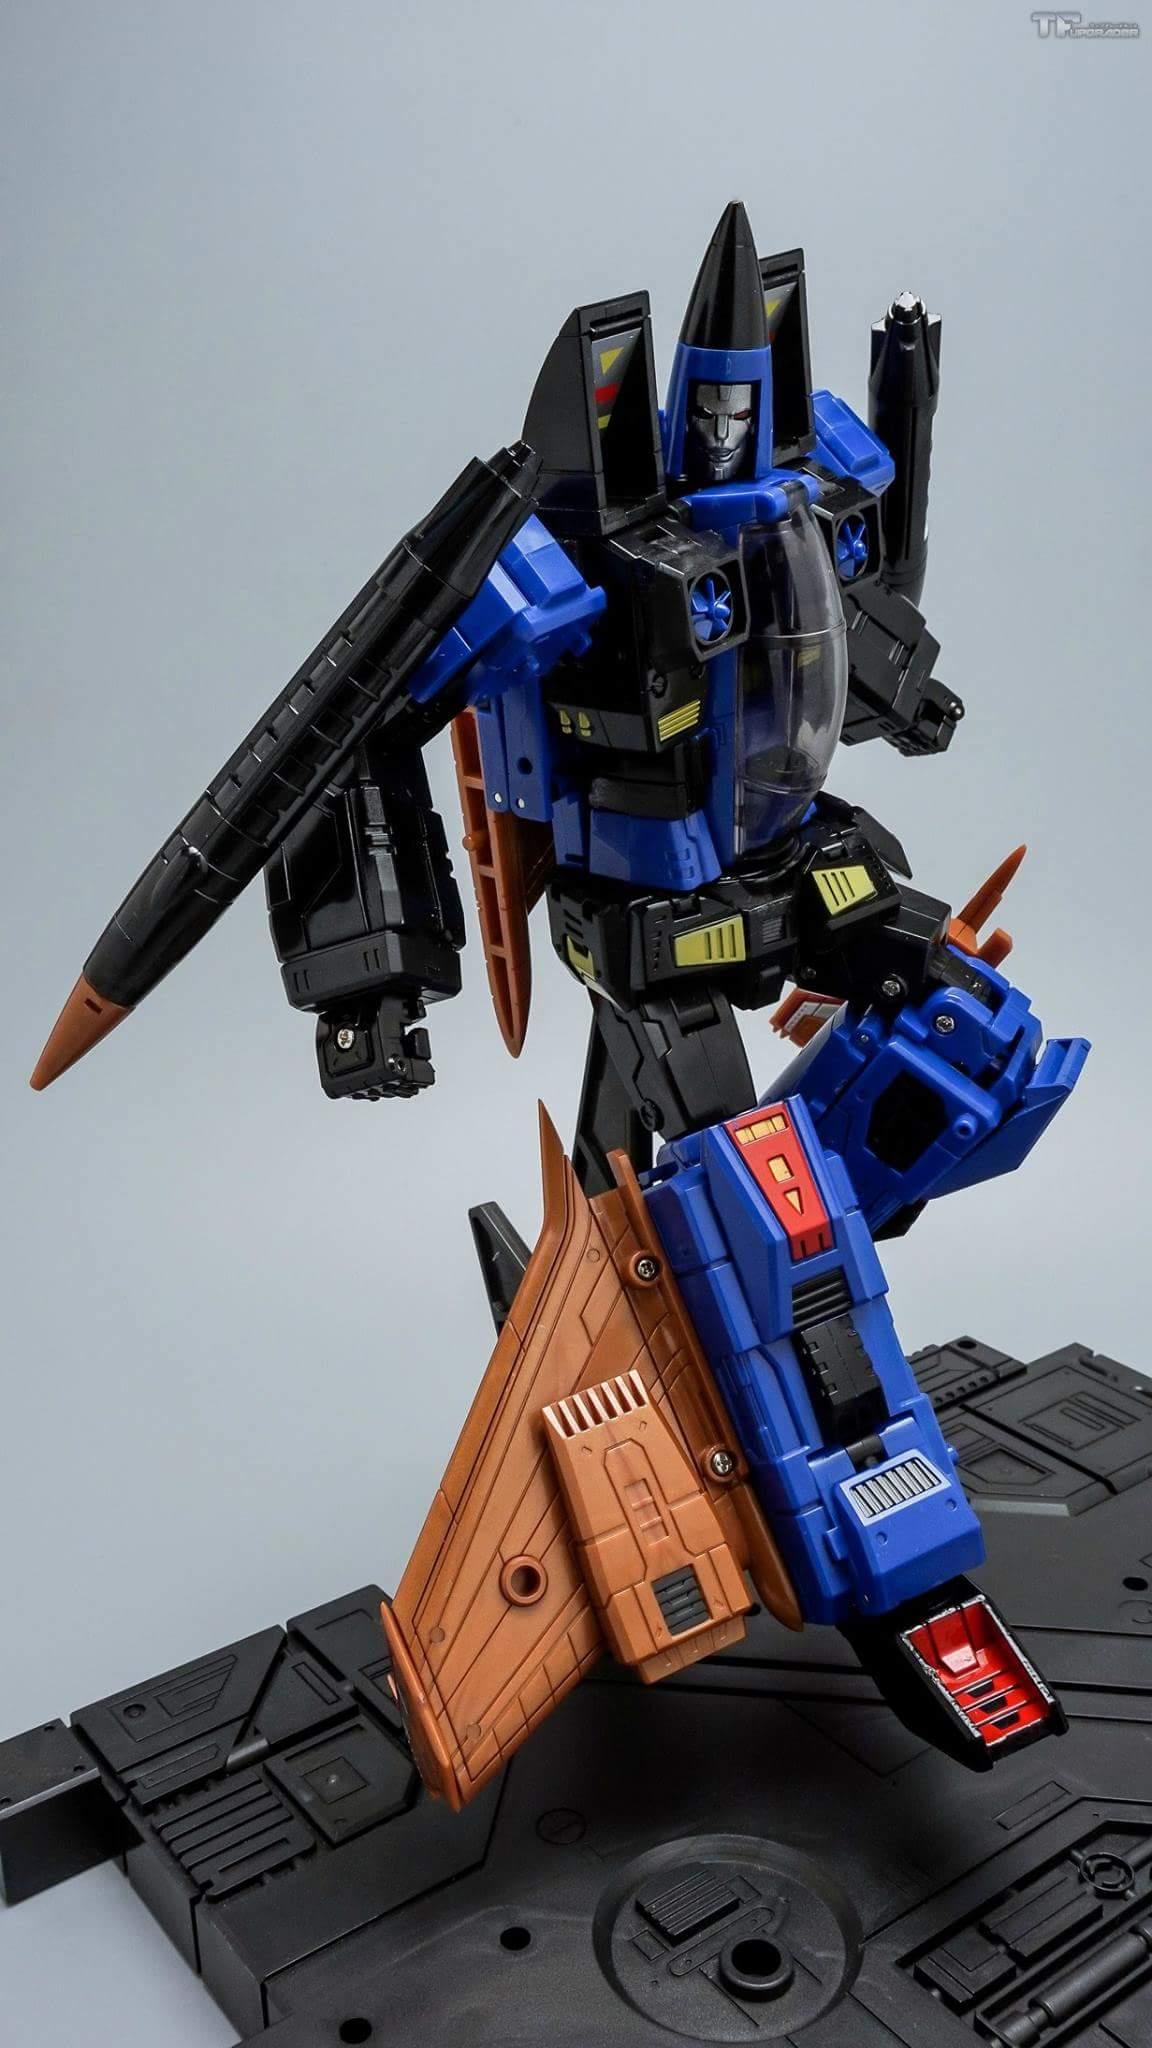 [ToyWorld] Produit Tiers - TW-M02A Combustor (Ramjet/Statoréacto), TW-M02B Assault (Thrust/Fatalo), TW-M02C Requiem (Dirge/Funébro) - Page 2 L6M5LXFo